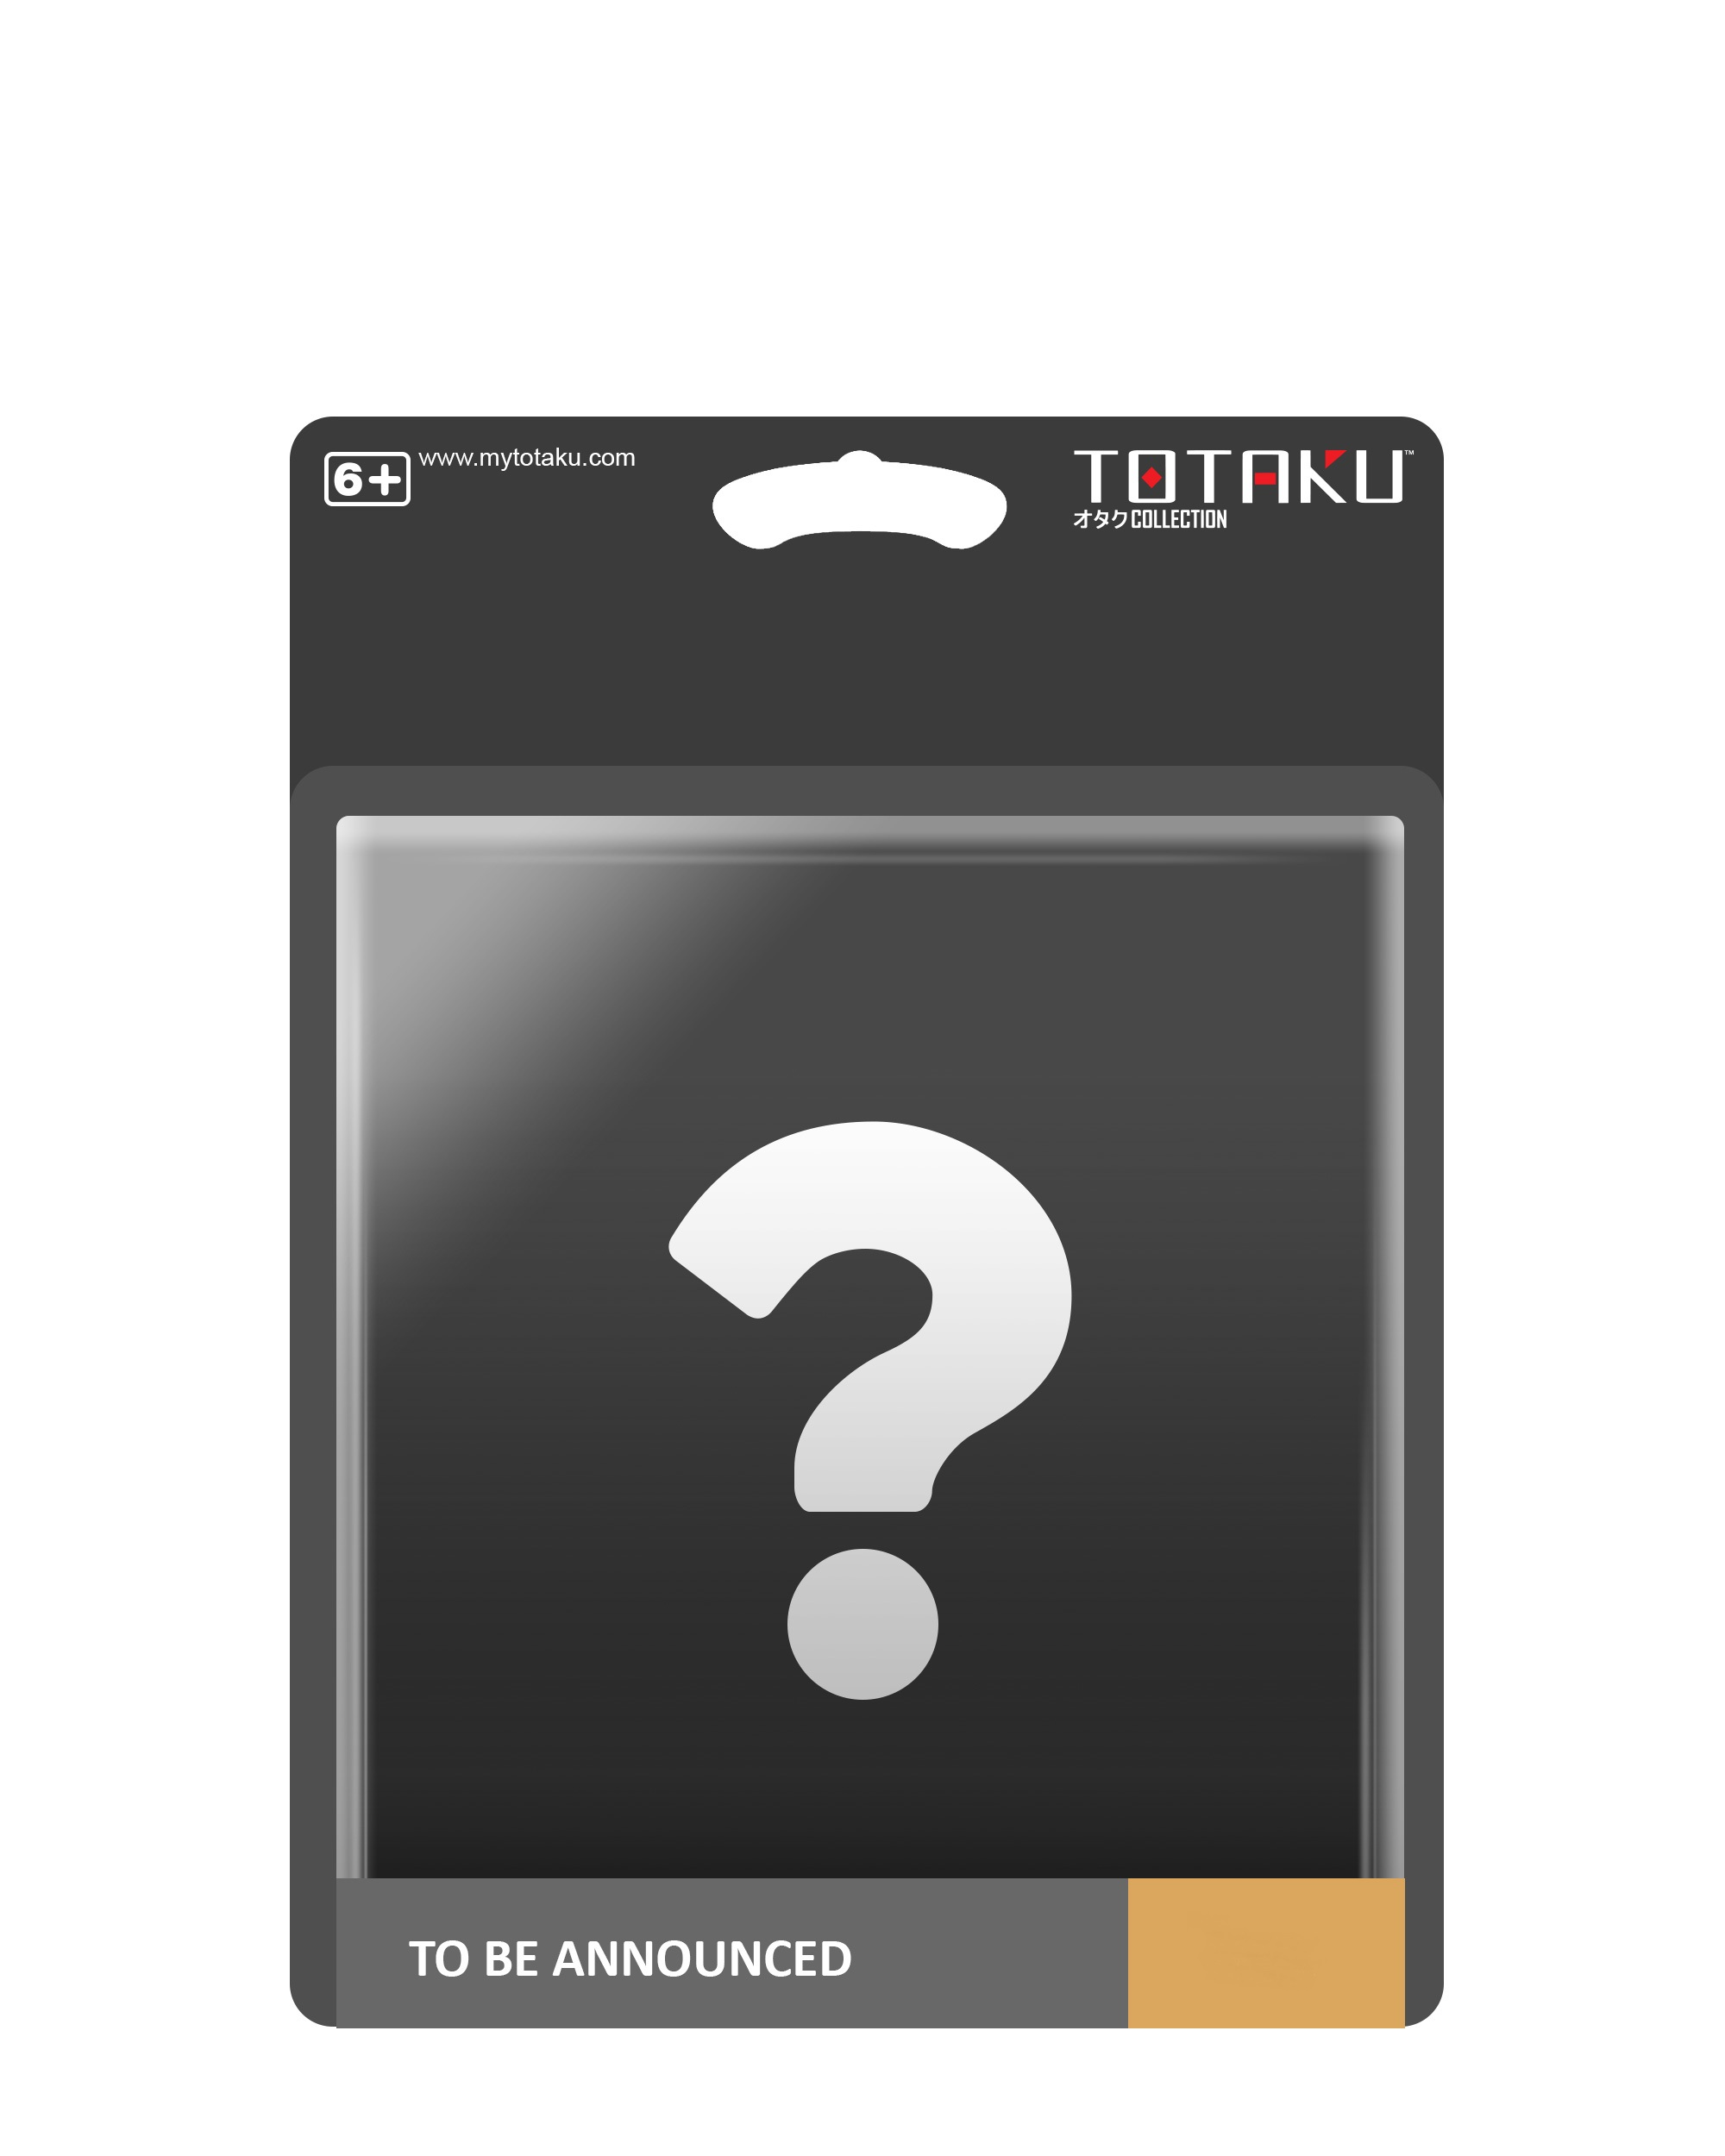 TOTAKU_Question_BOX-14-20190723092145048